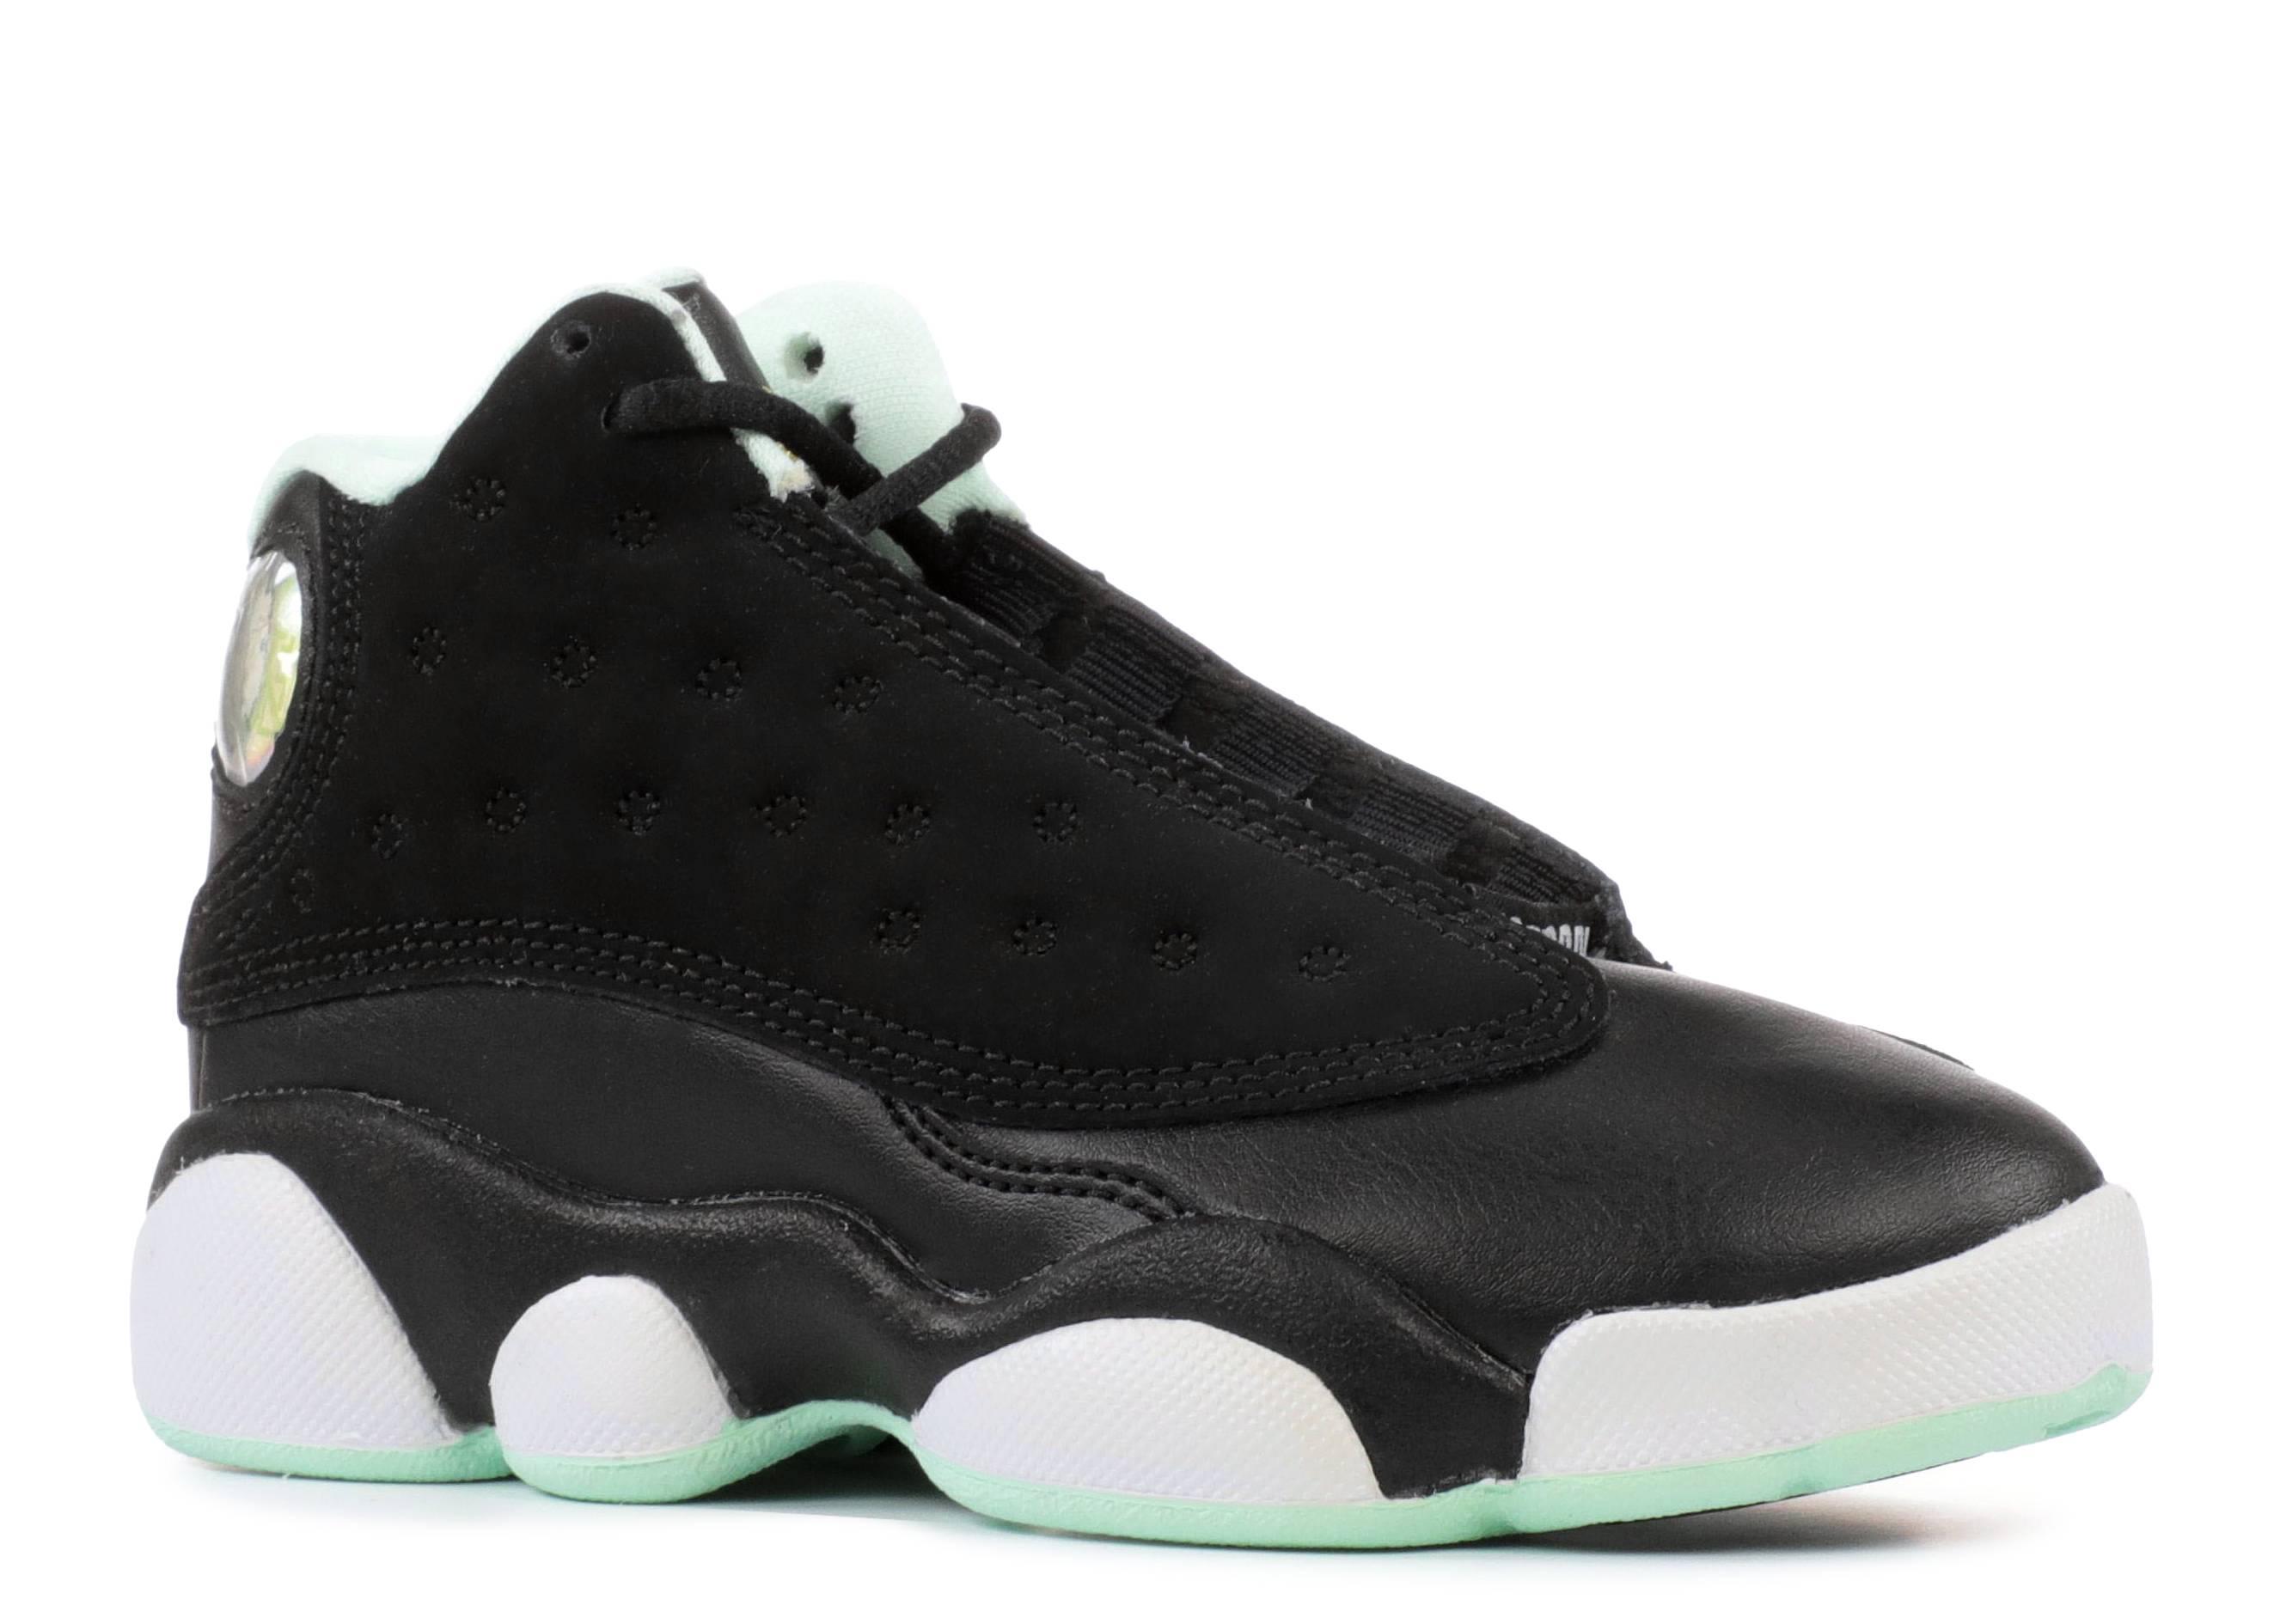 Air Jordan 13 Retro PS # 439669 018 White Wolf Grey Kids SZ 11-3